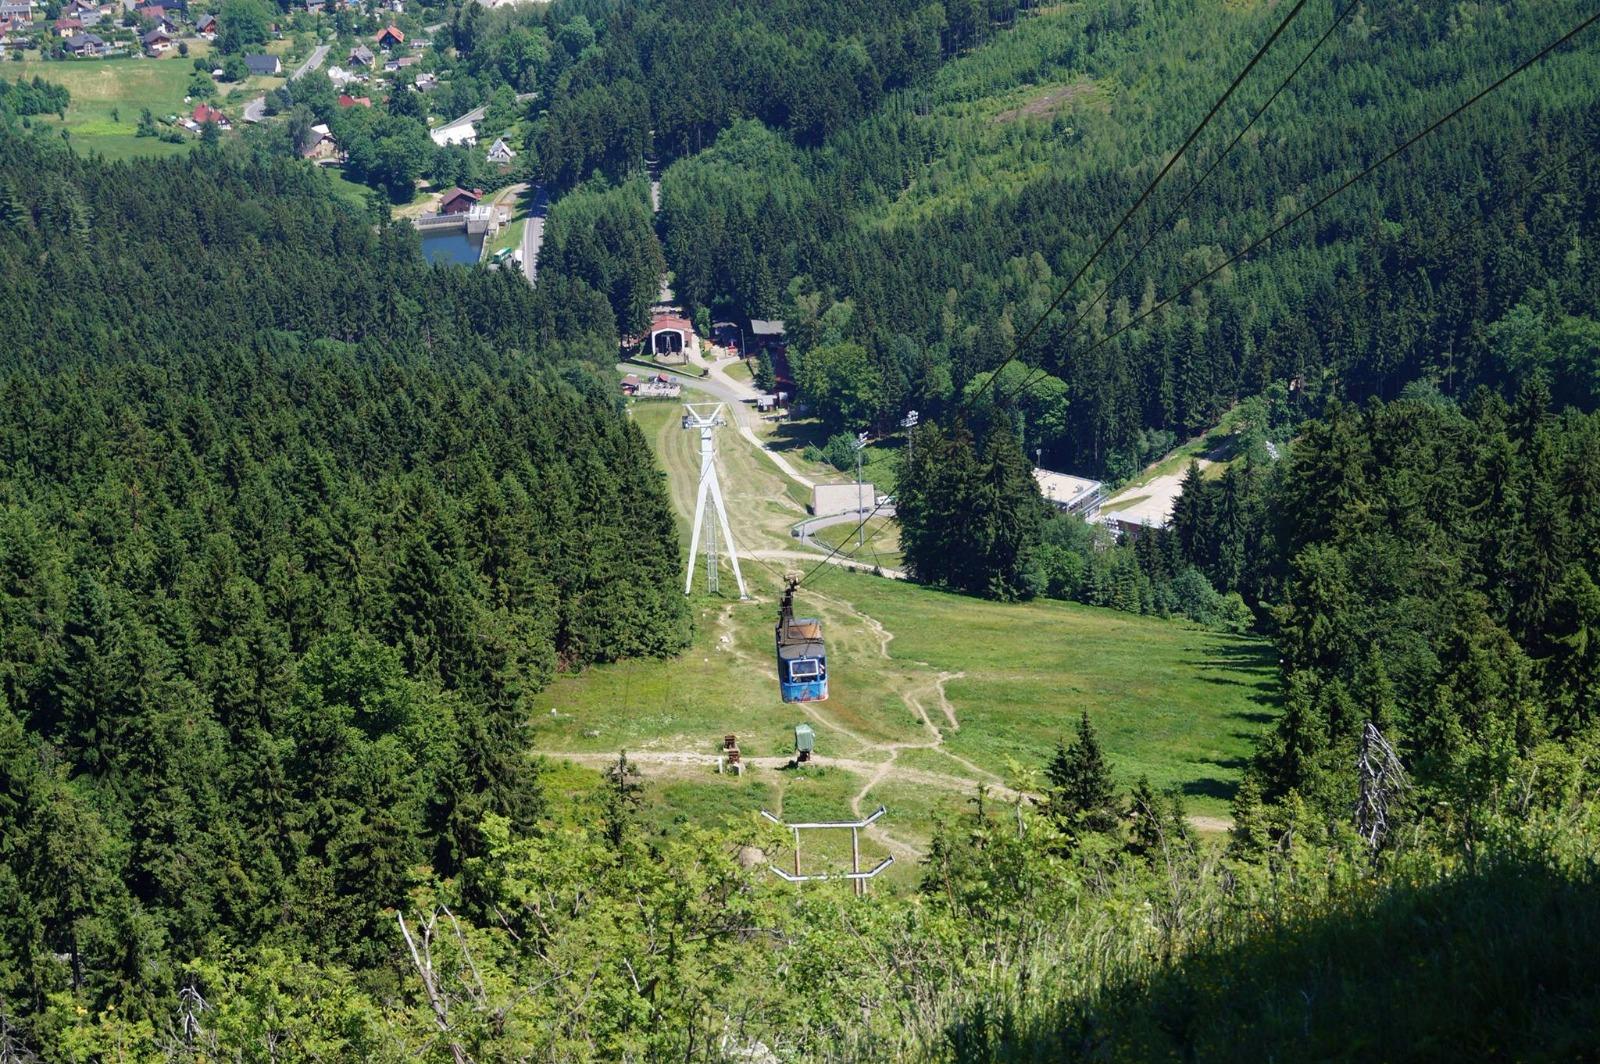 Lanovka Liberec - Ještěd